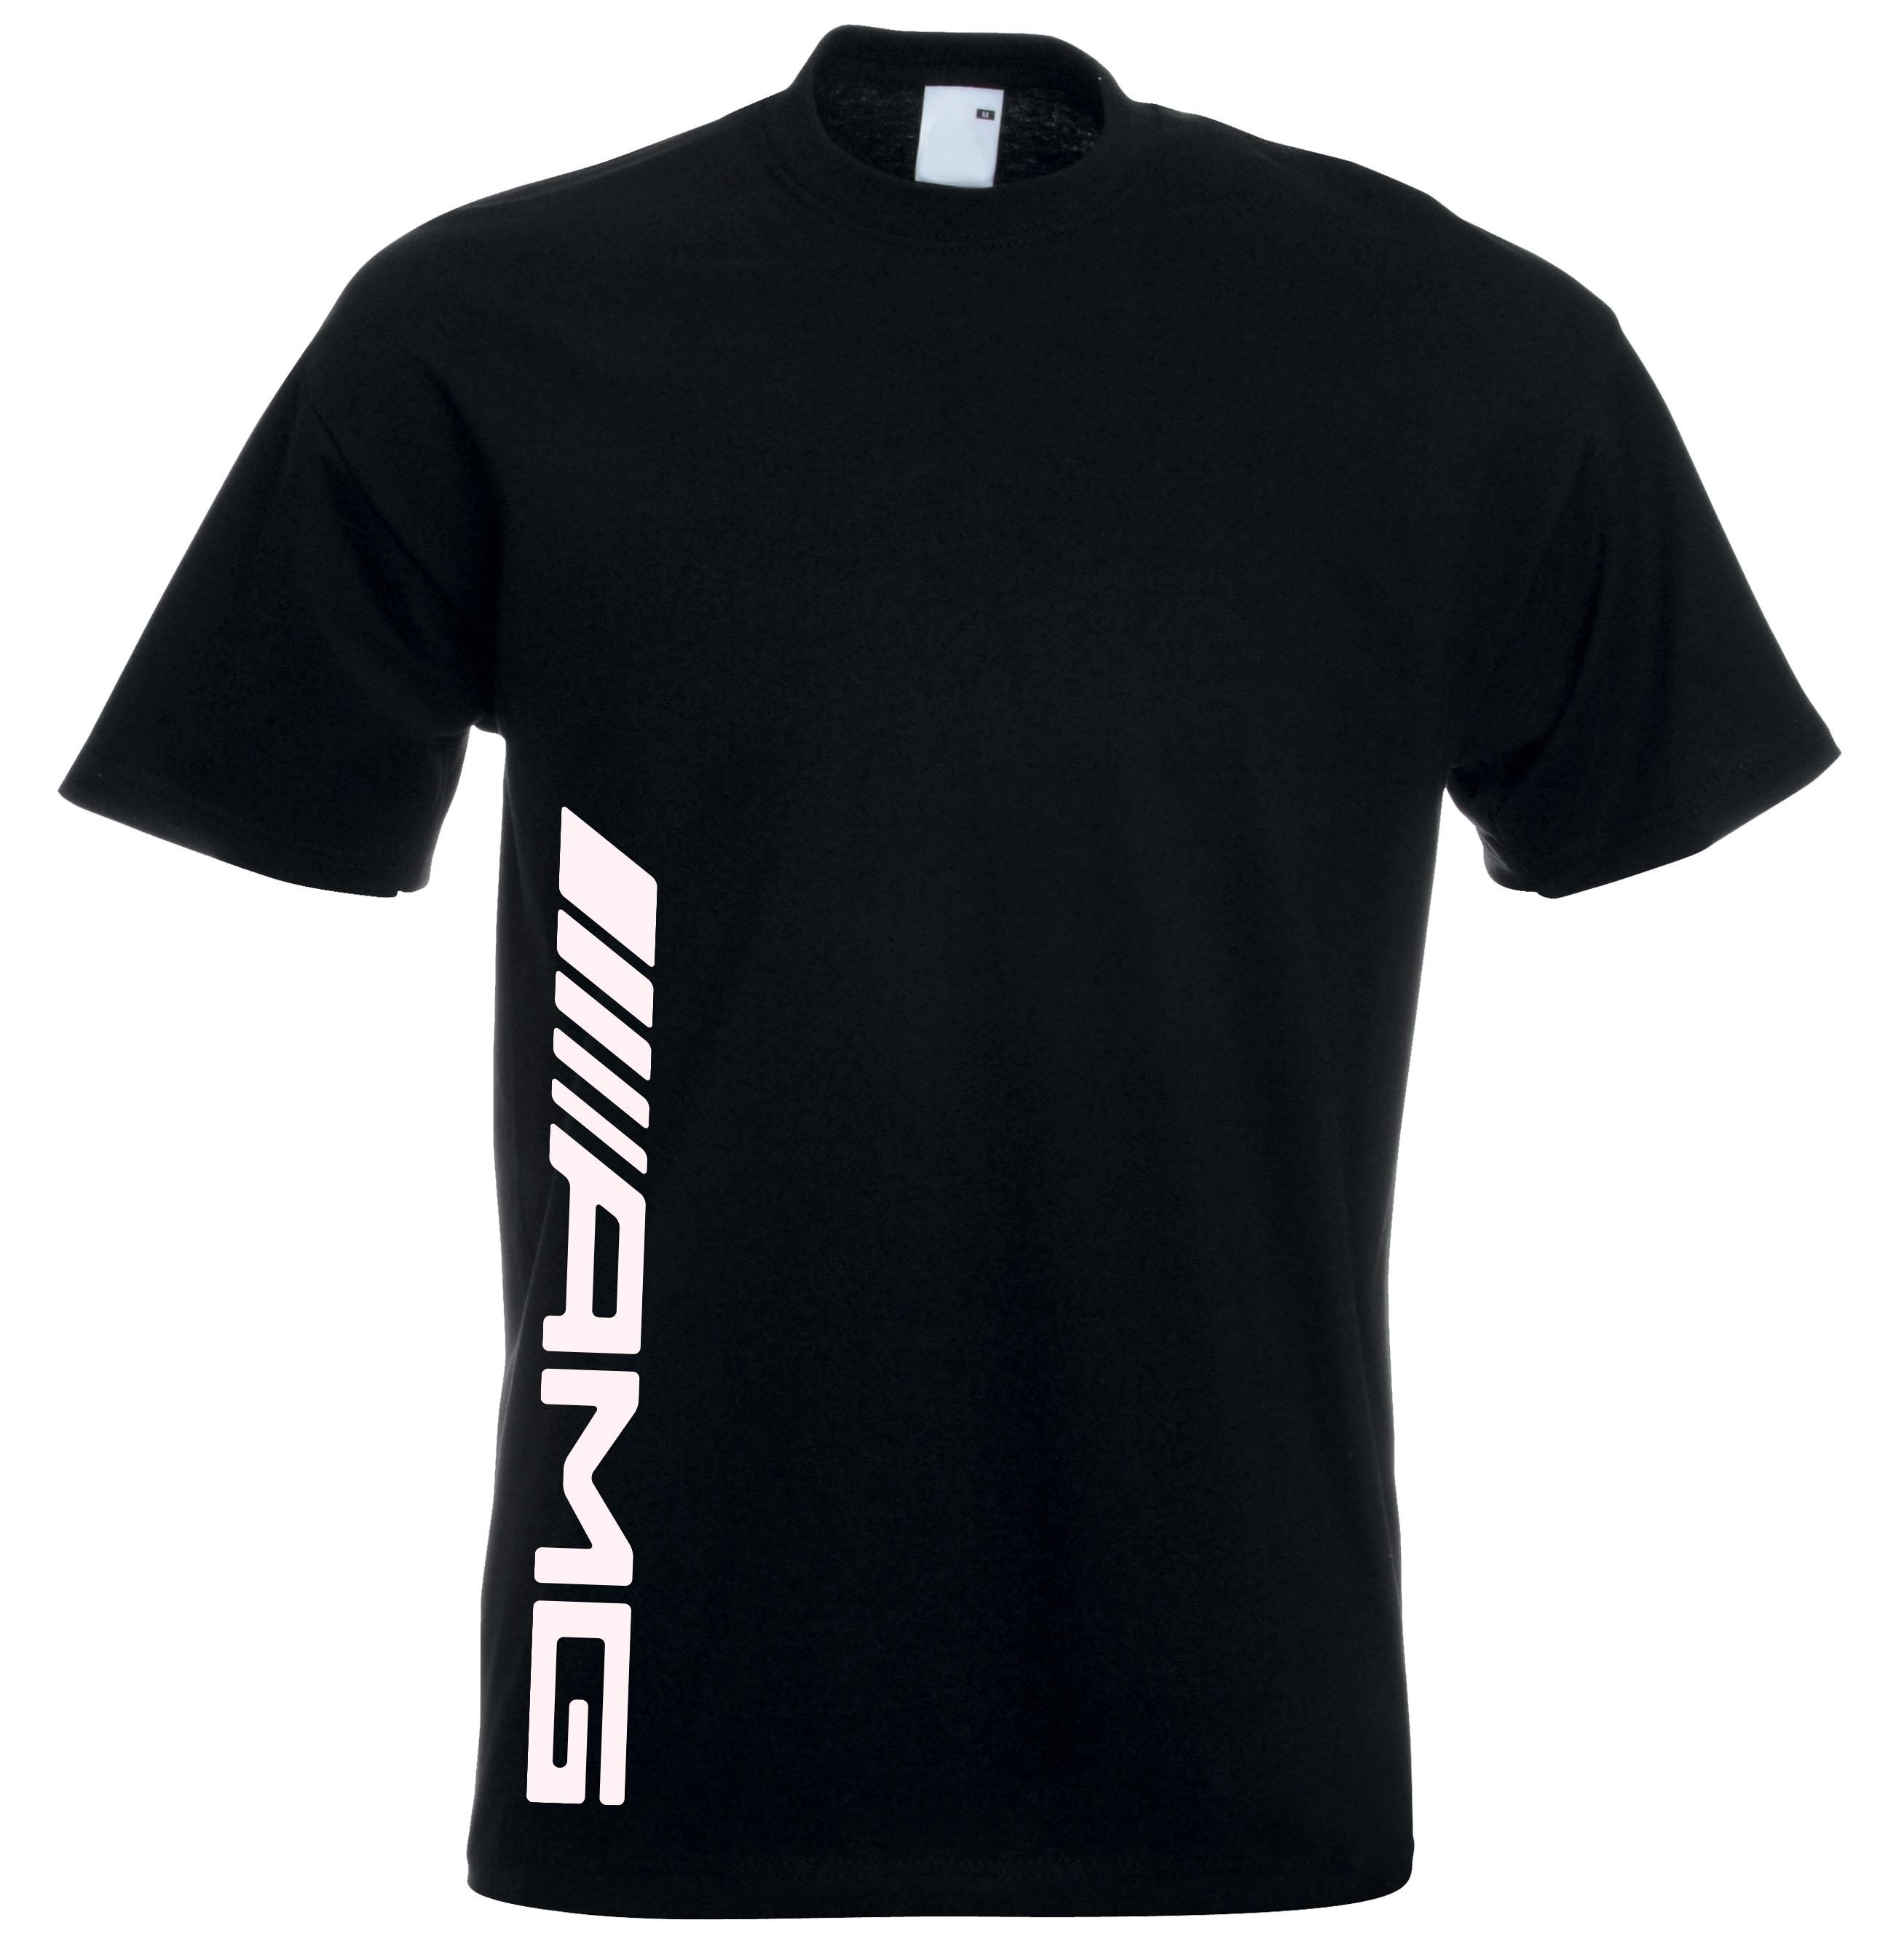 benz racing distressed mercedes on logo shirt shirts t black a nissan pin